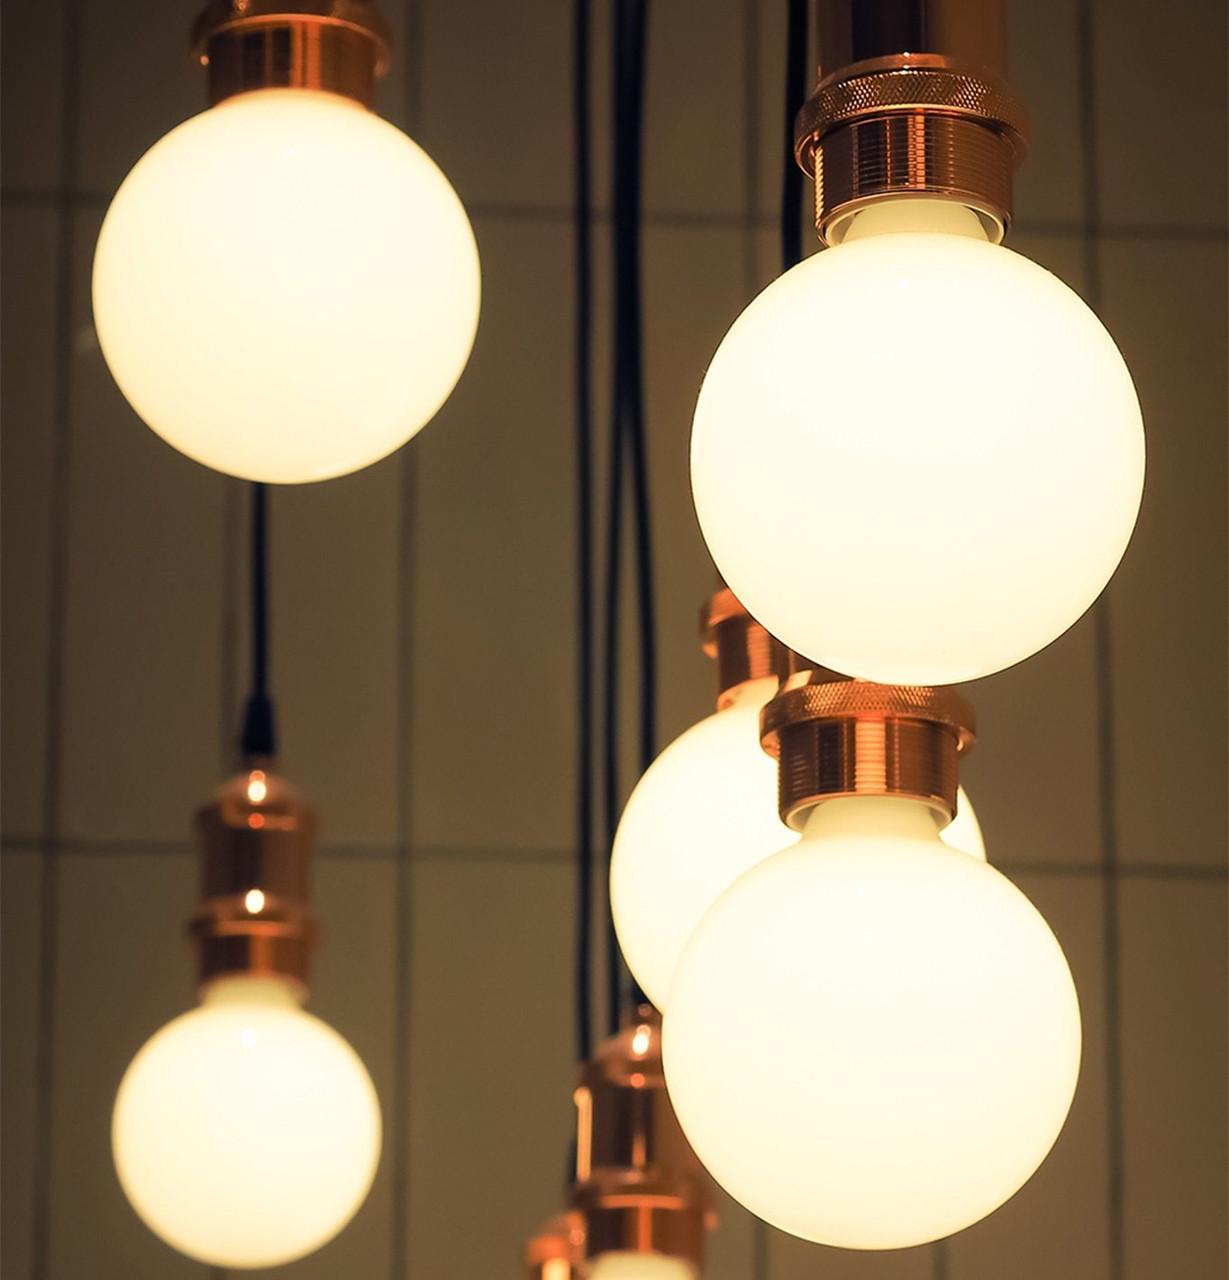 LED Globe BC Light Bulbs